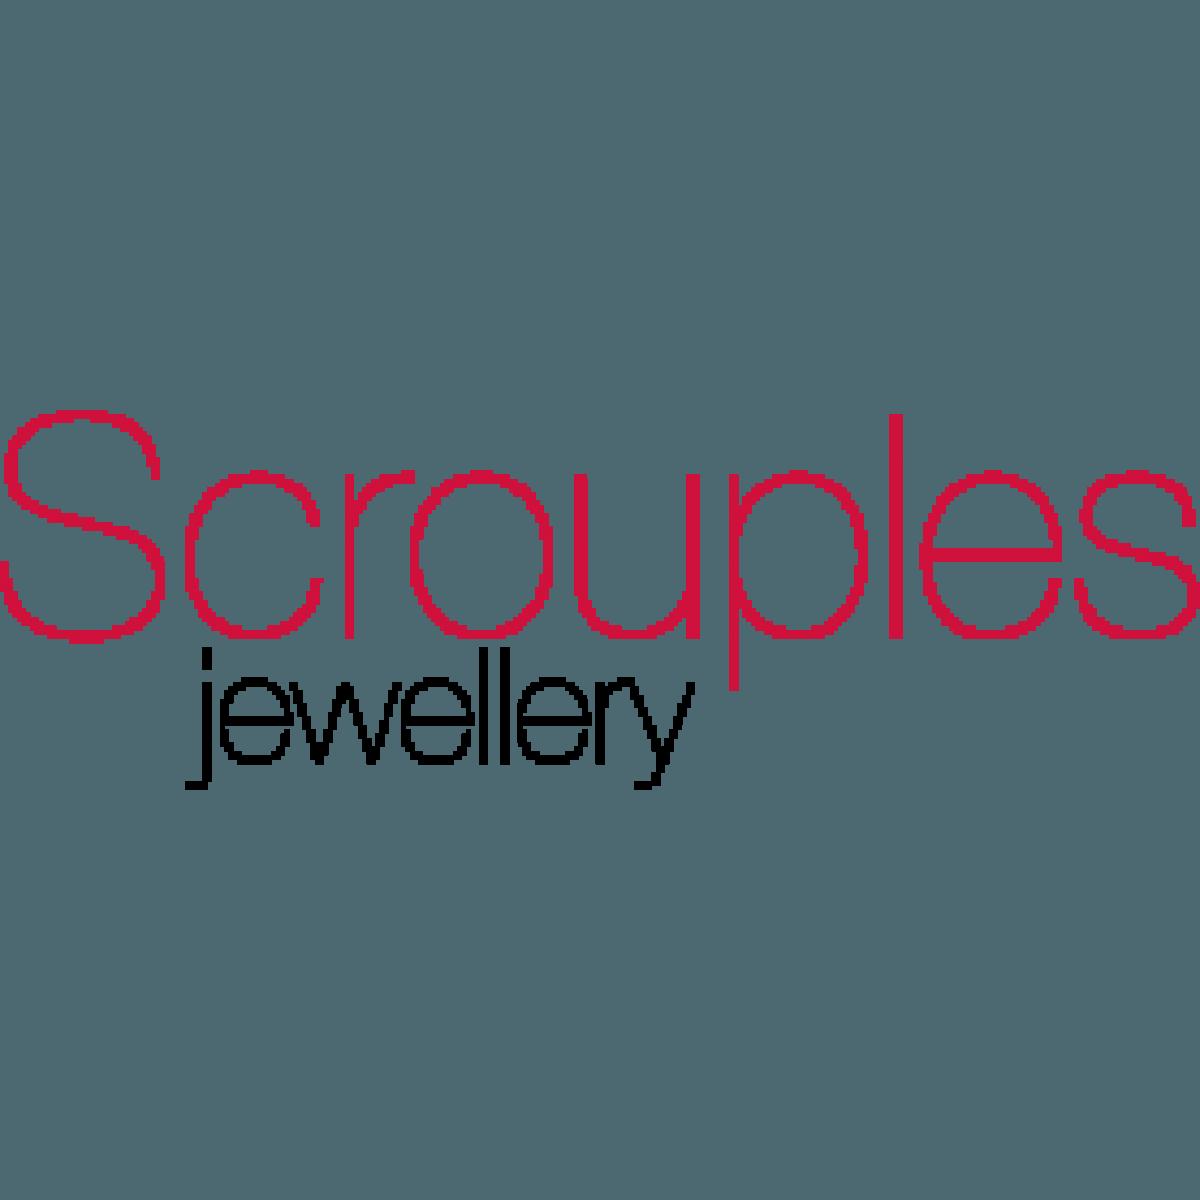 Scrouples logo.png